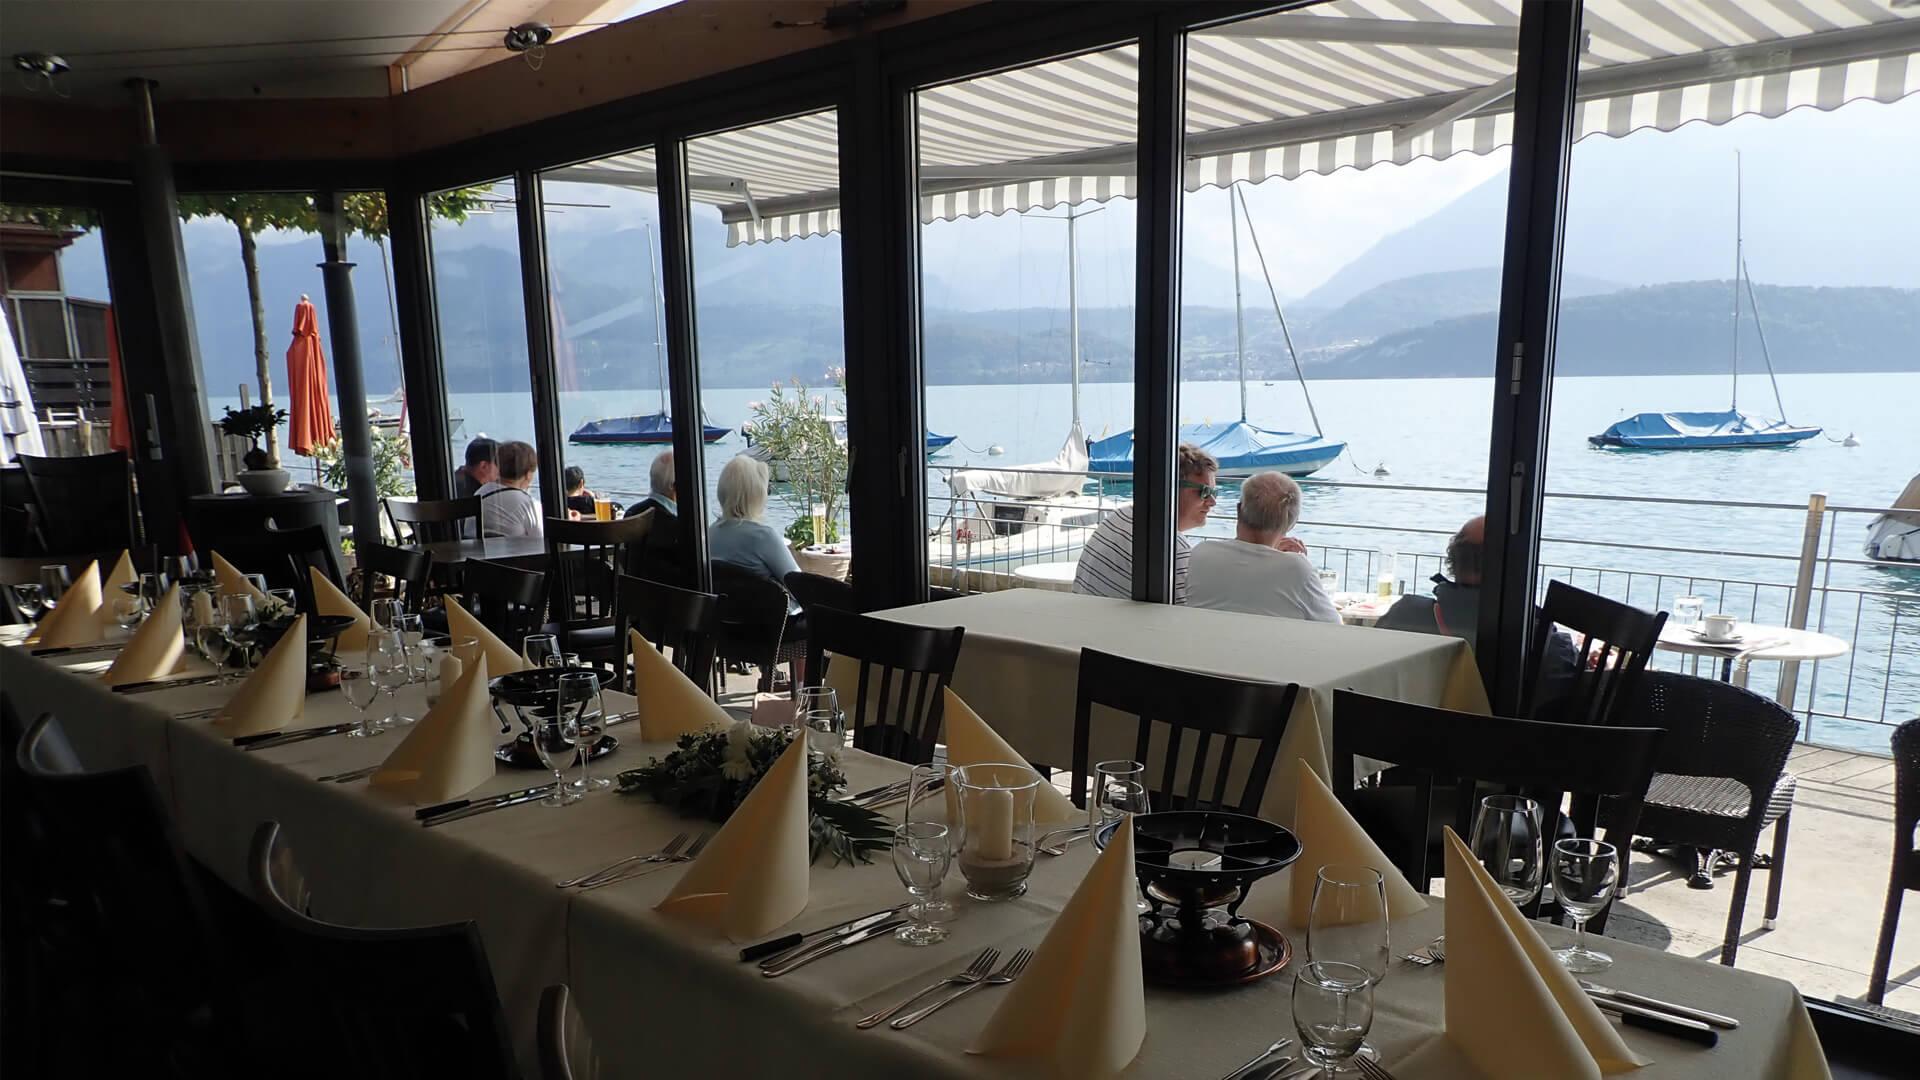 edenbeach_restaurant-speisesaal-2